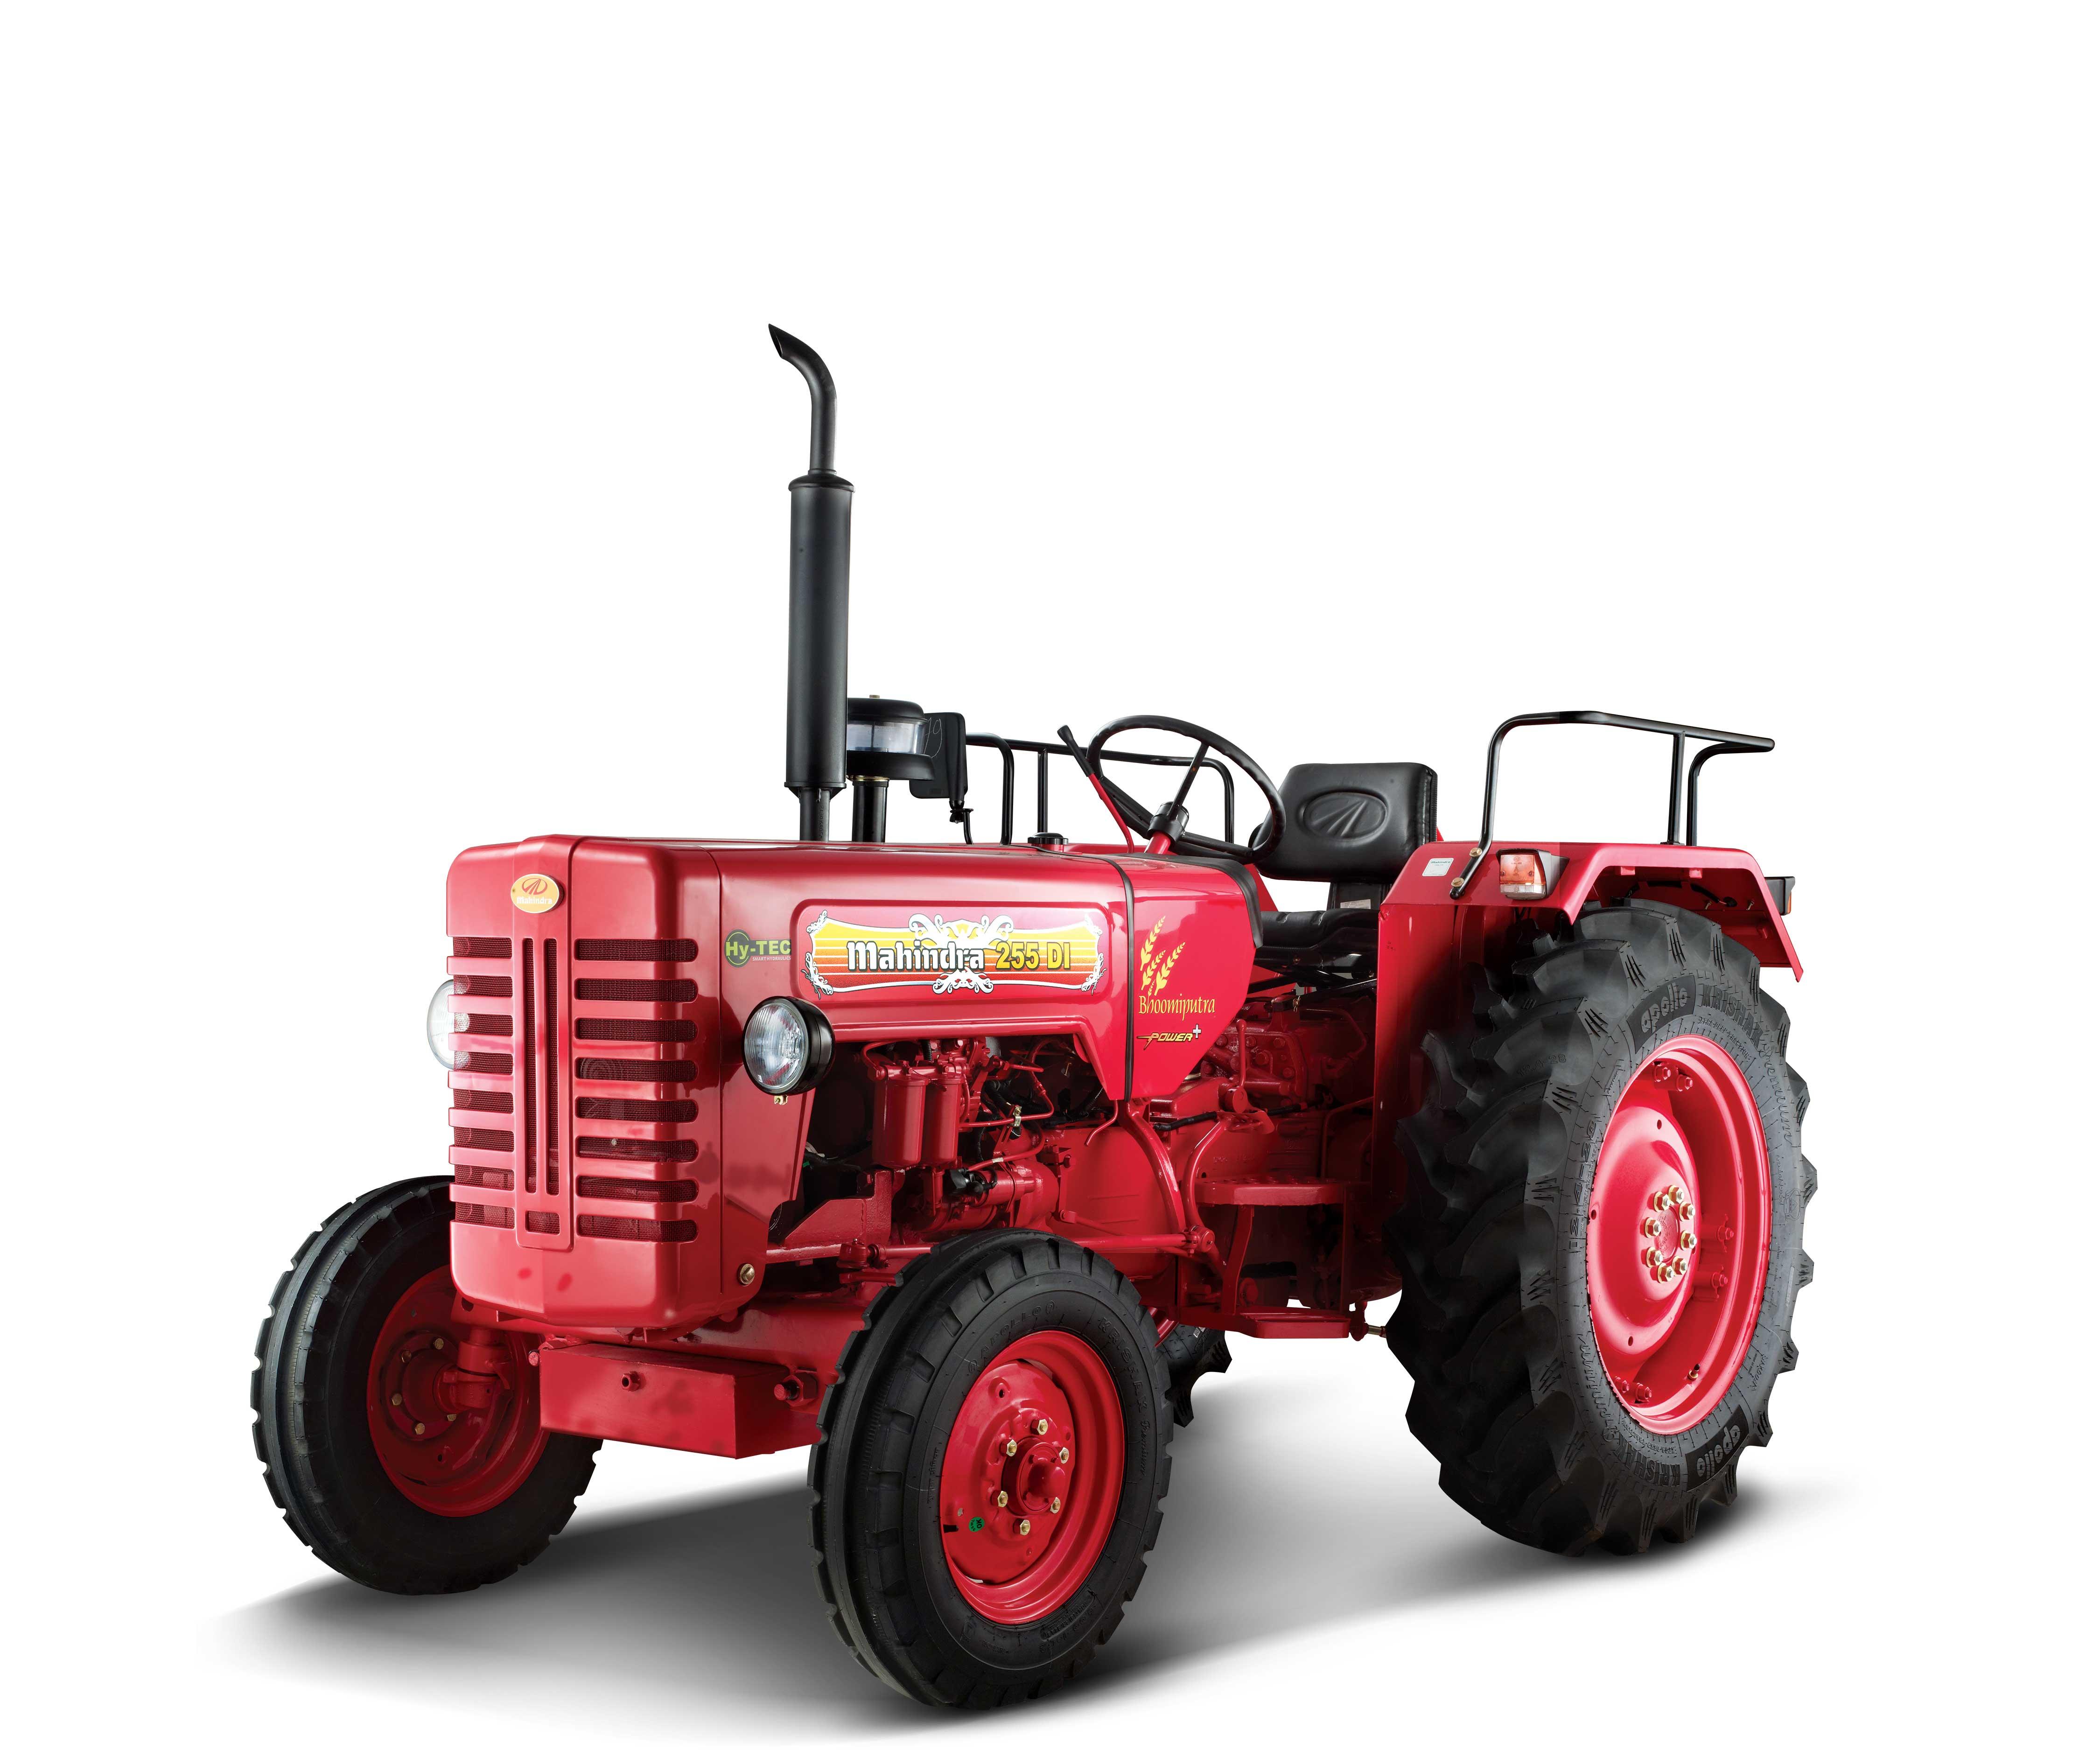 Mahindra Tractors launches the new Mahindra 255 DI Power ...